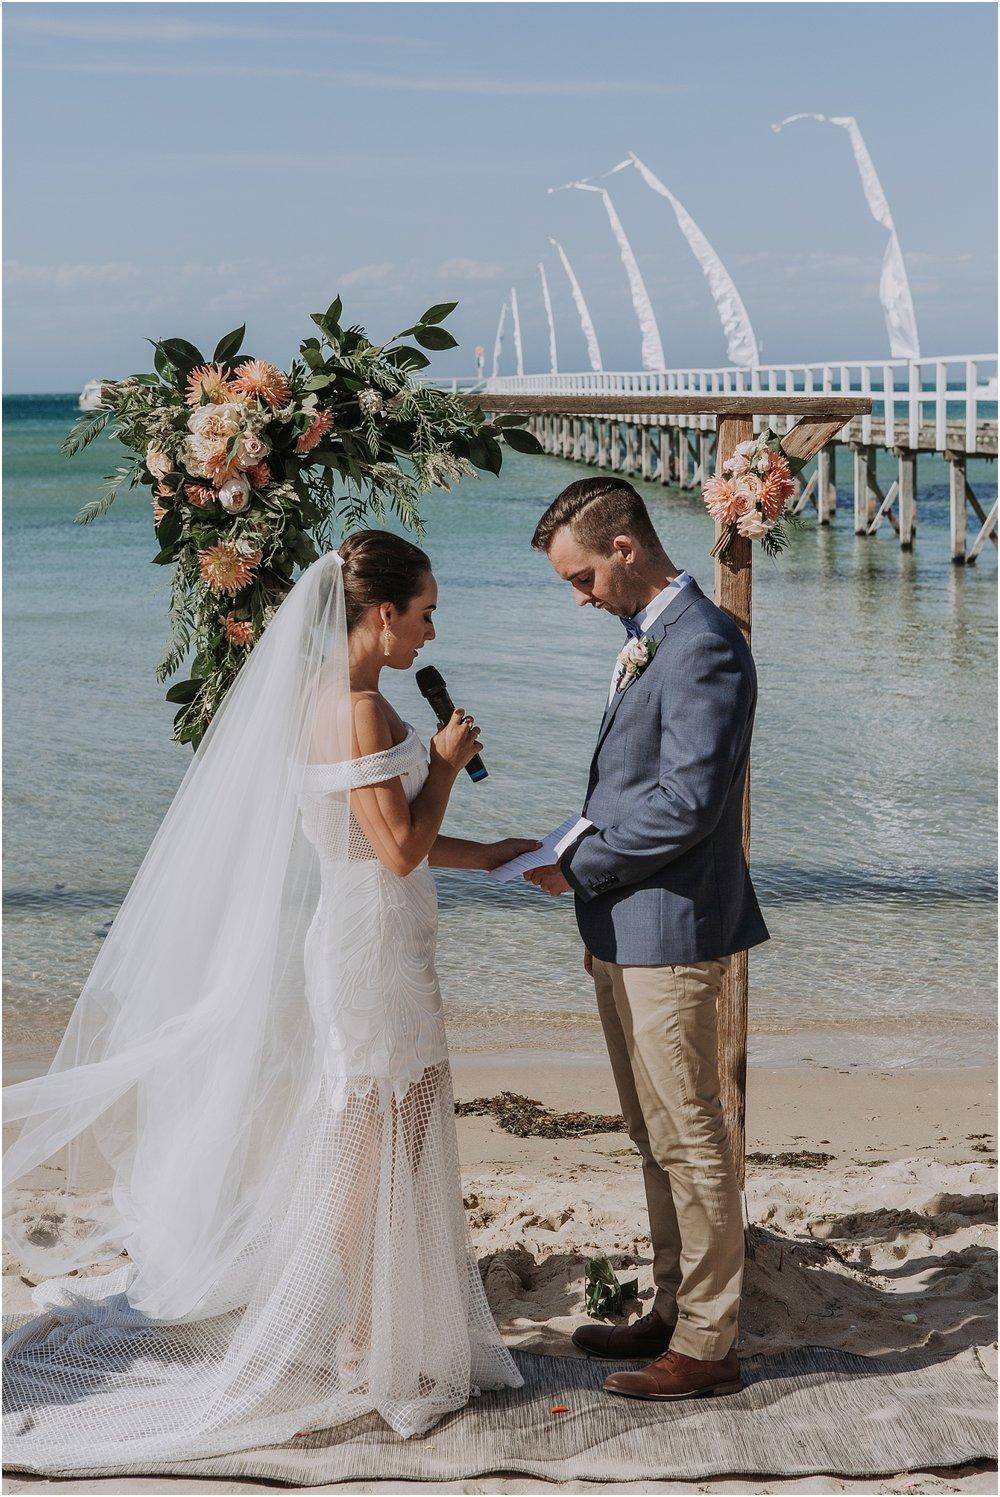 Kali and Simon's beach wedding at The Baths Sorrento on the Mornington Peninsula._0054.jpg